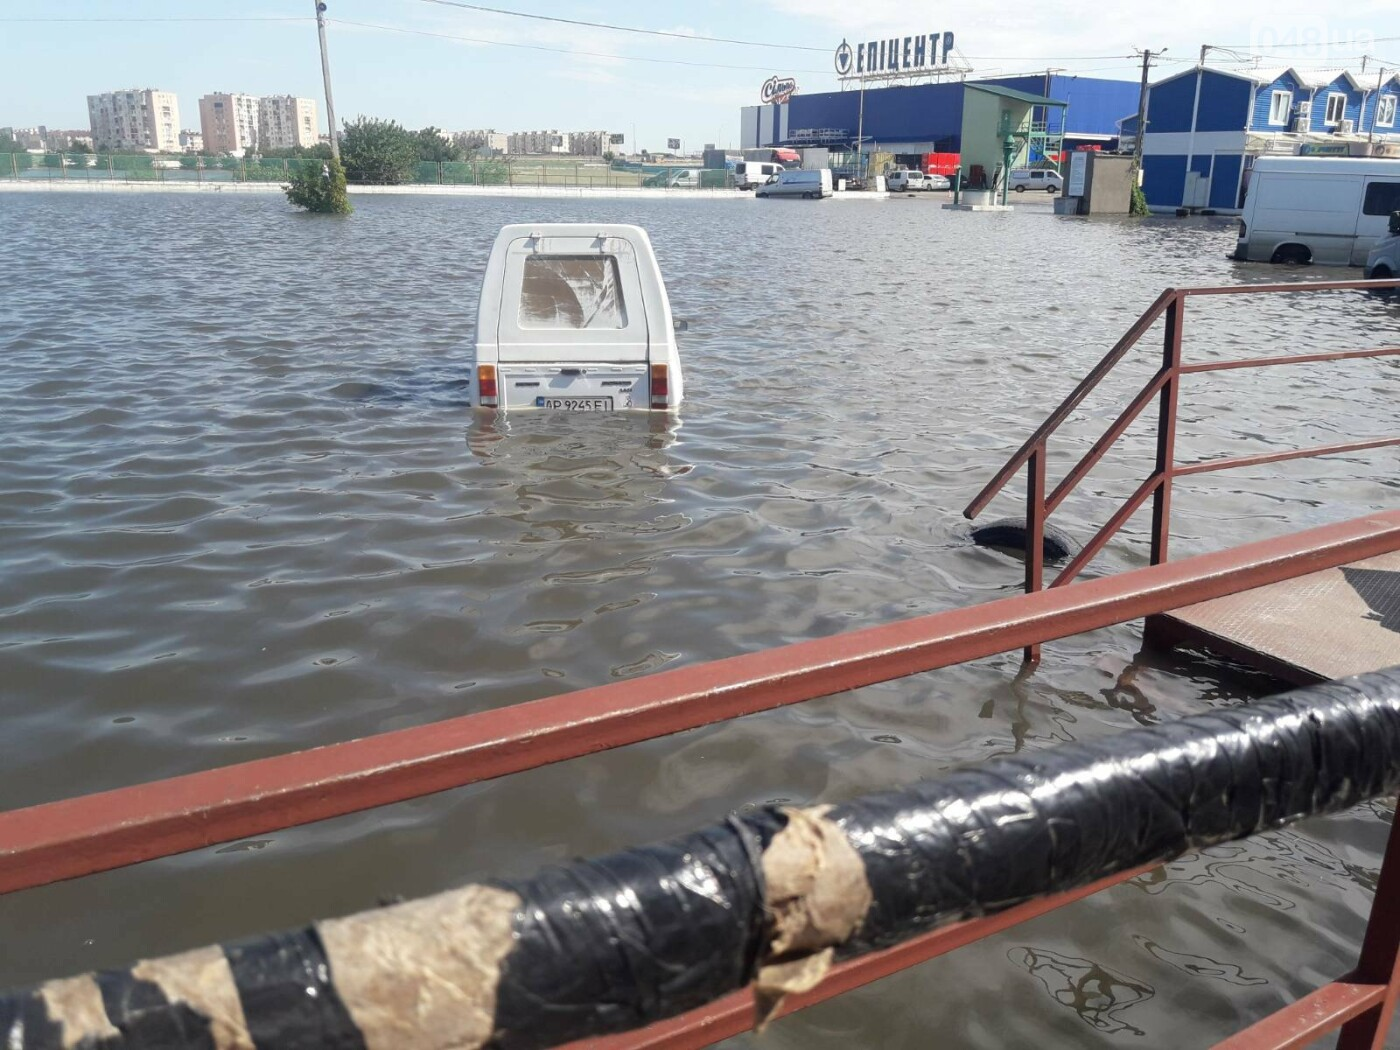 На промрынке 7км в Одессе образовалось море, - ФОТО, фото-10